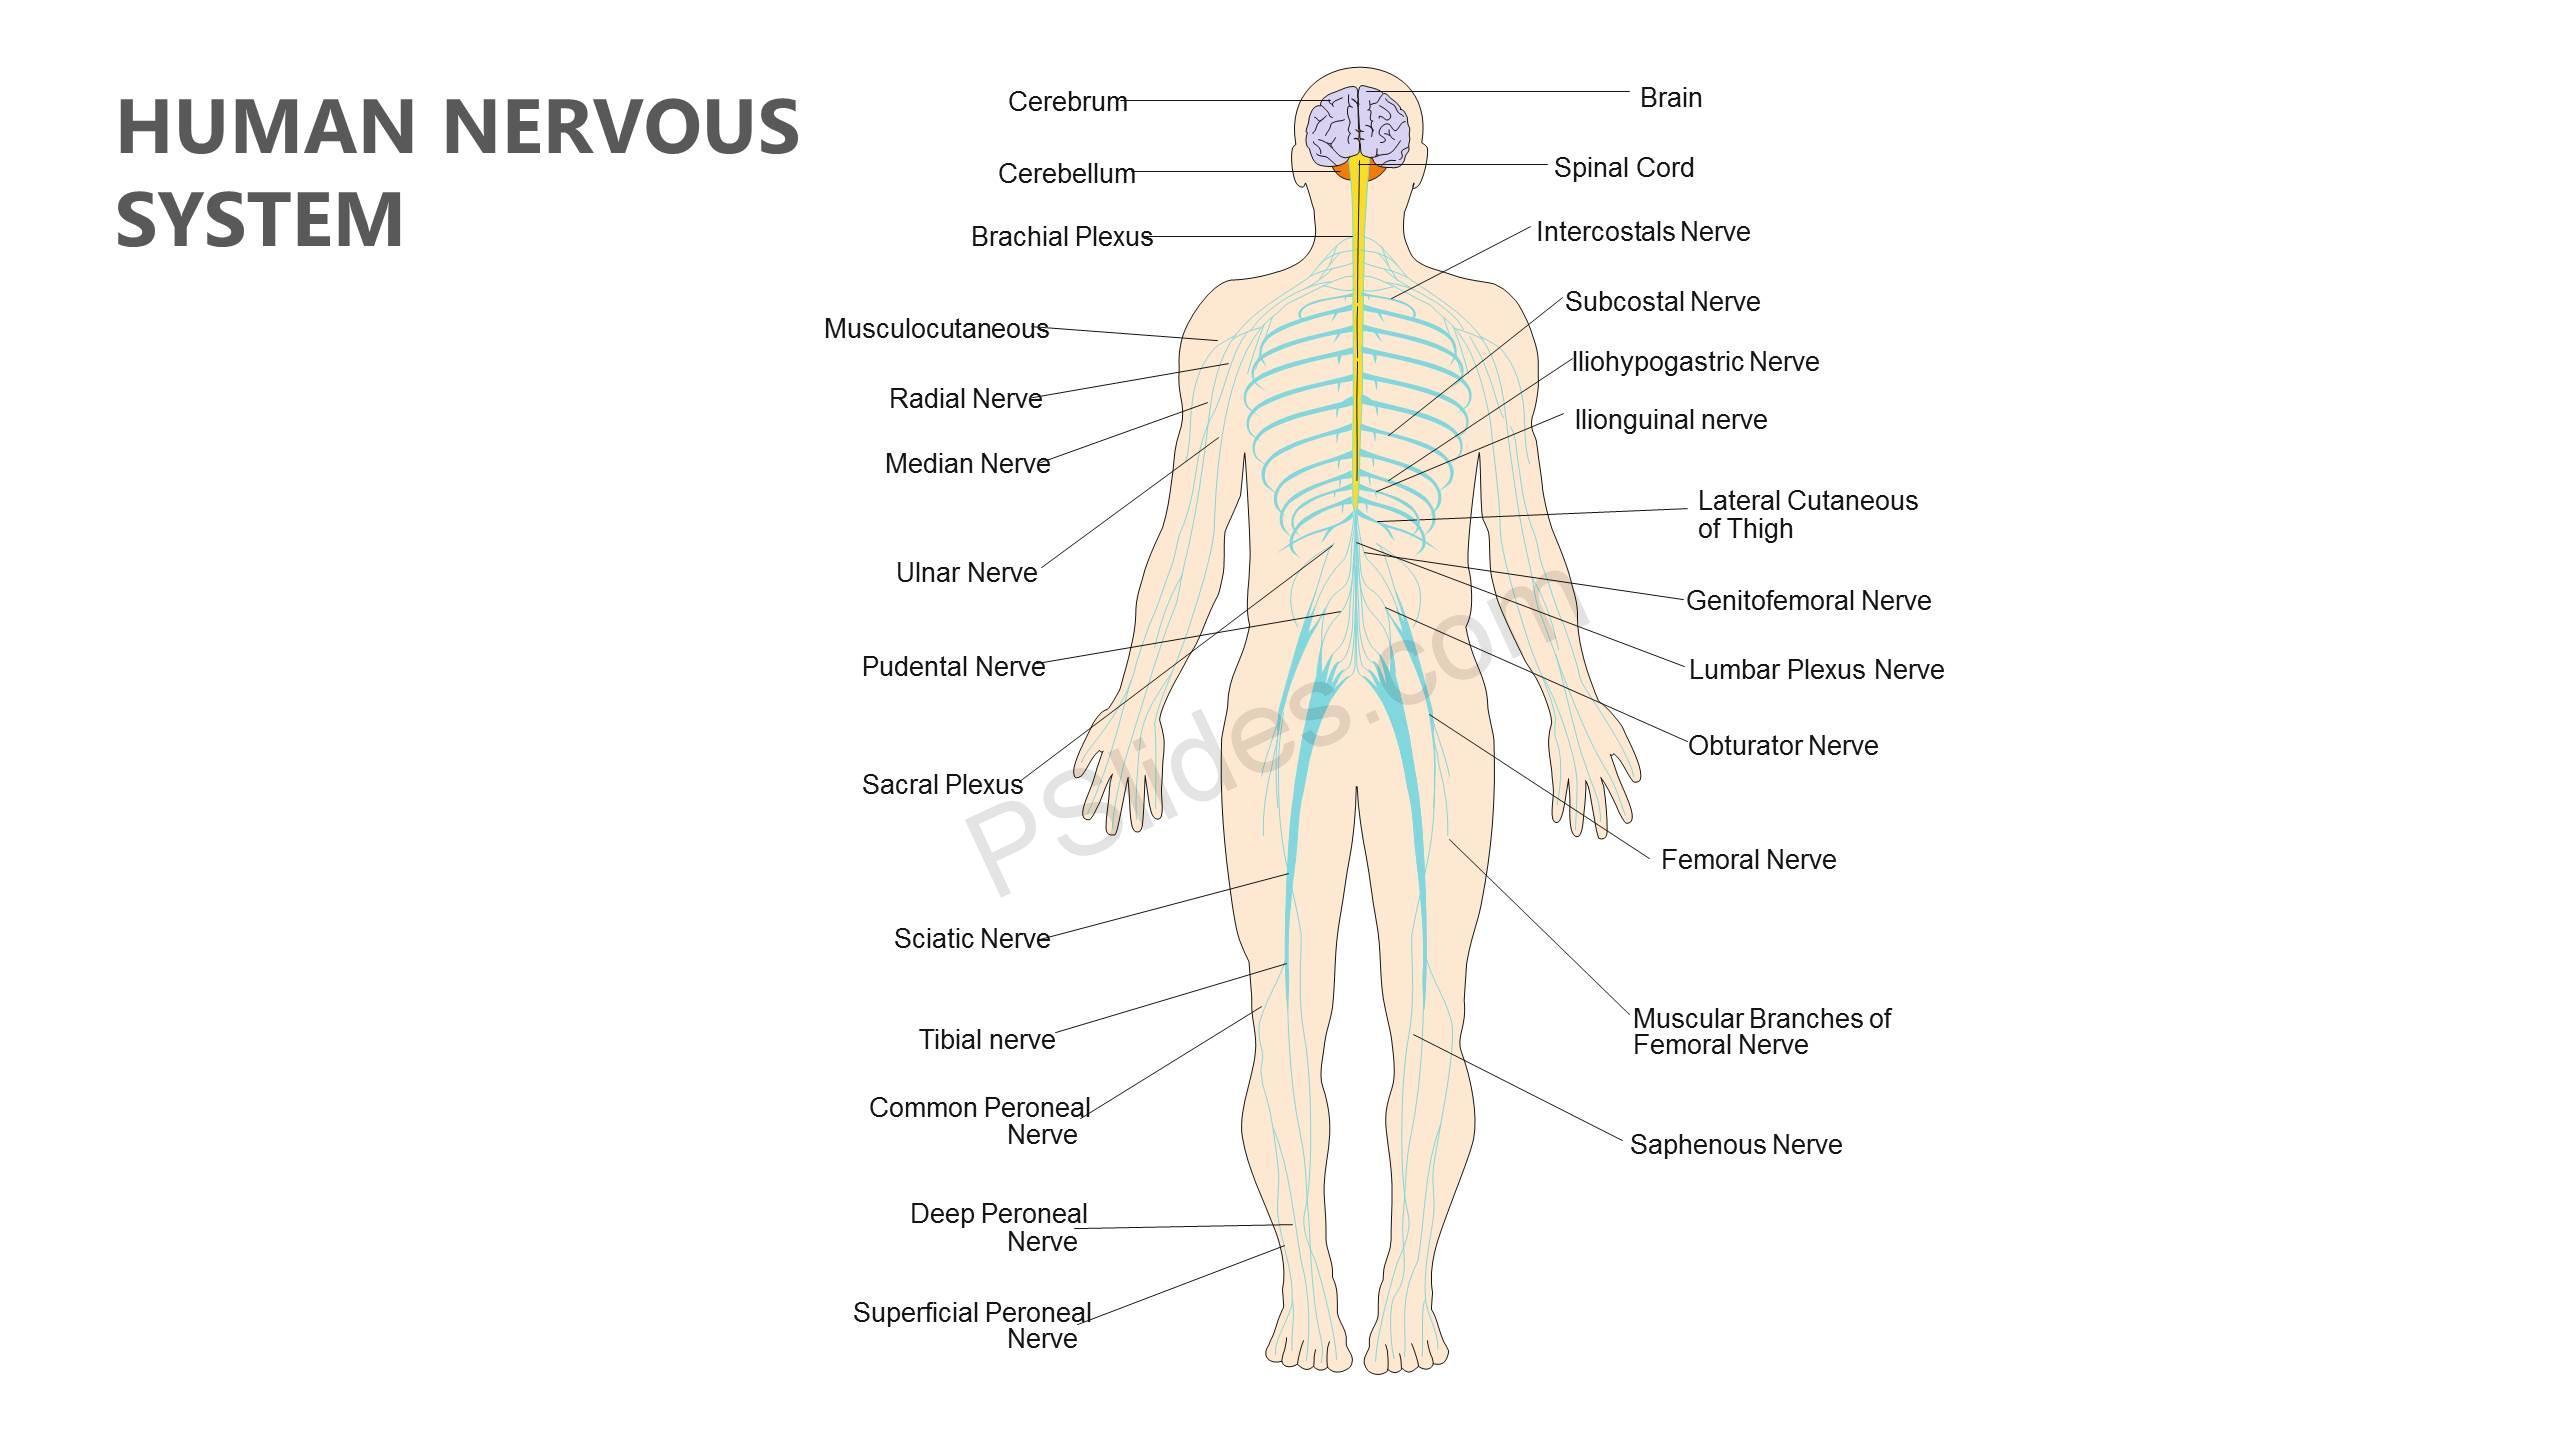 Human Nervous System Powerpoint Diagram